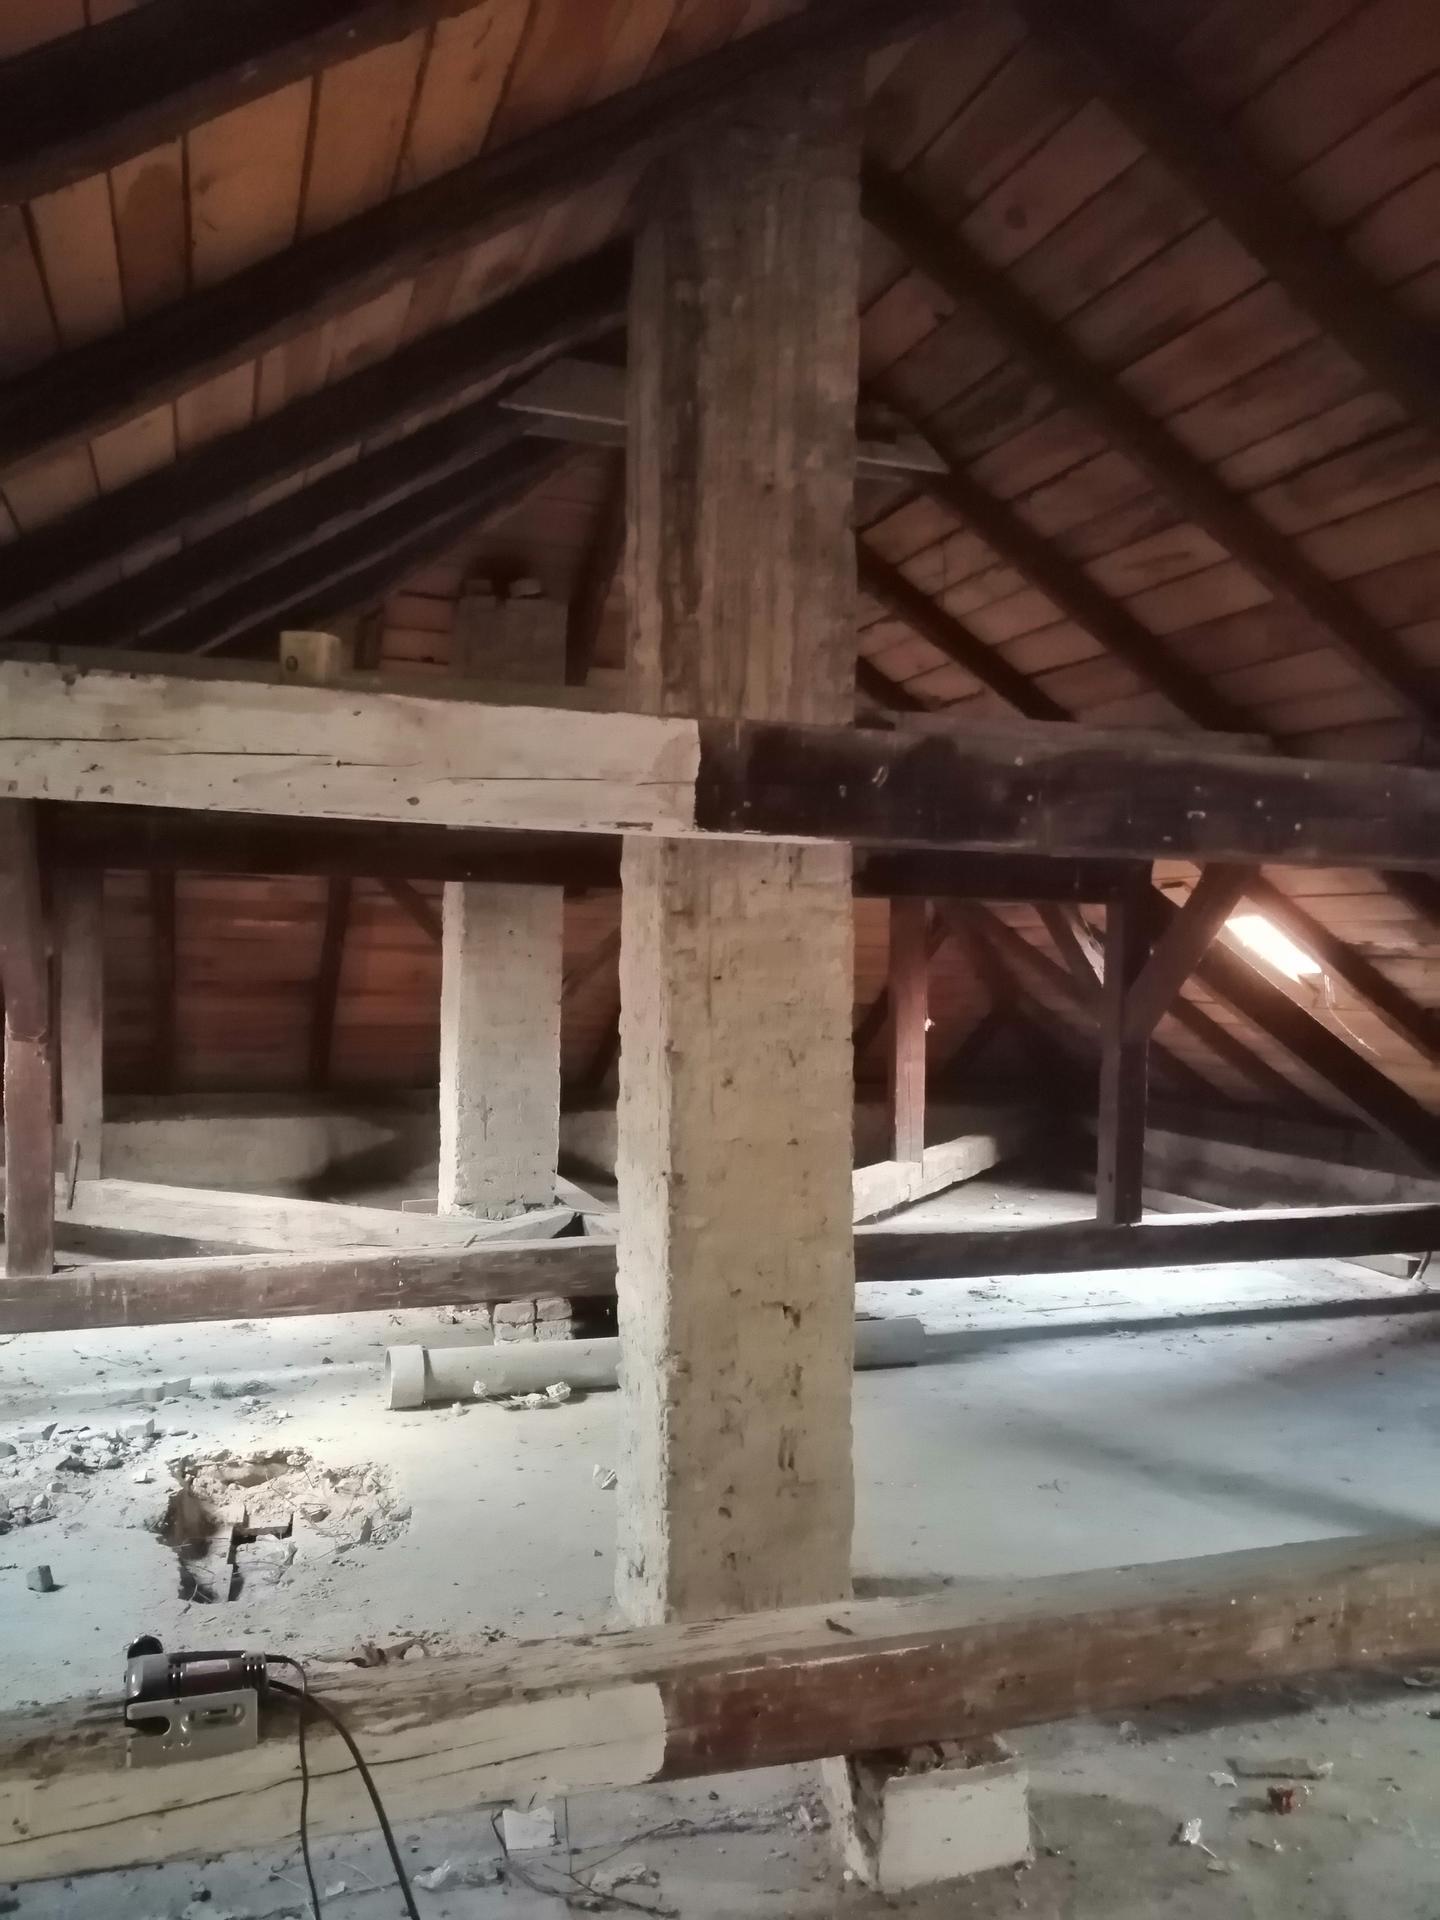 Prestavba podkrovia zo sedlovo valbovej na sedlovú strechu. - Obrázok č. 32